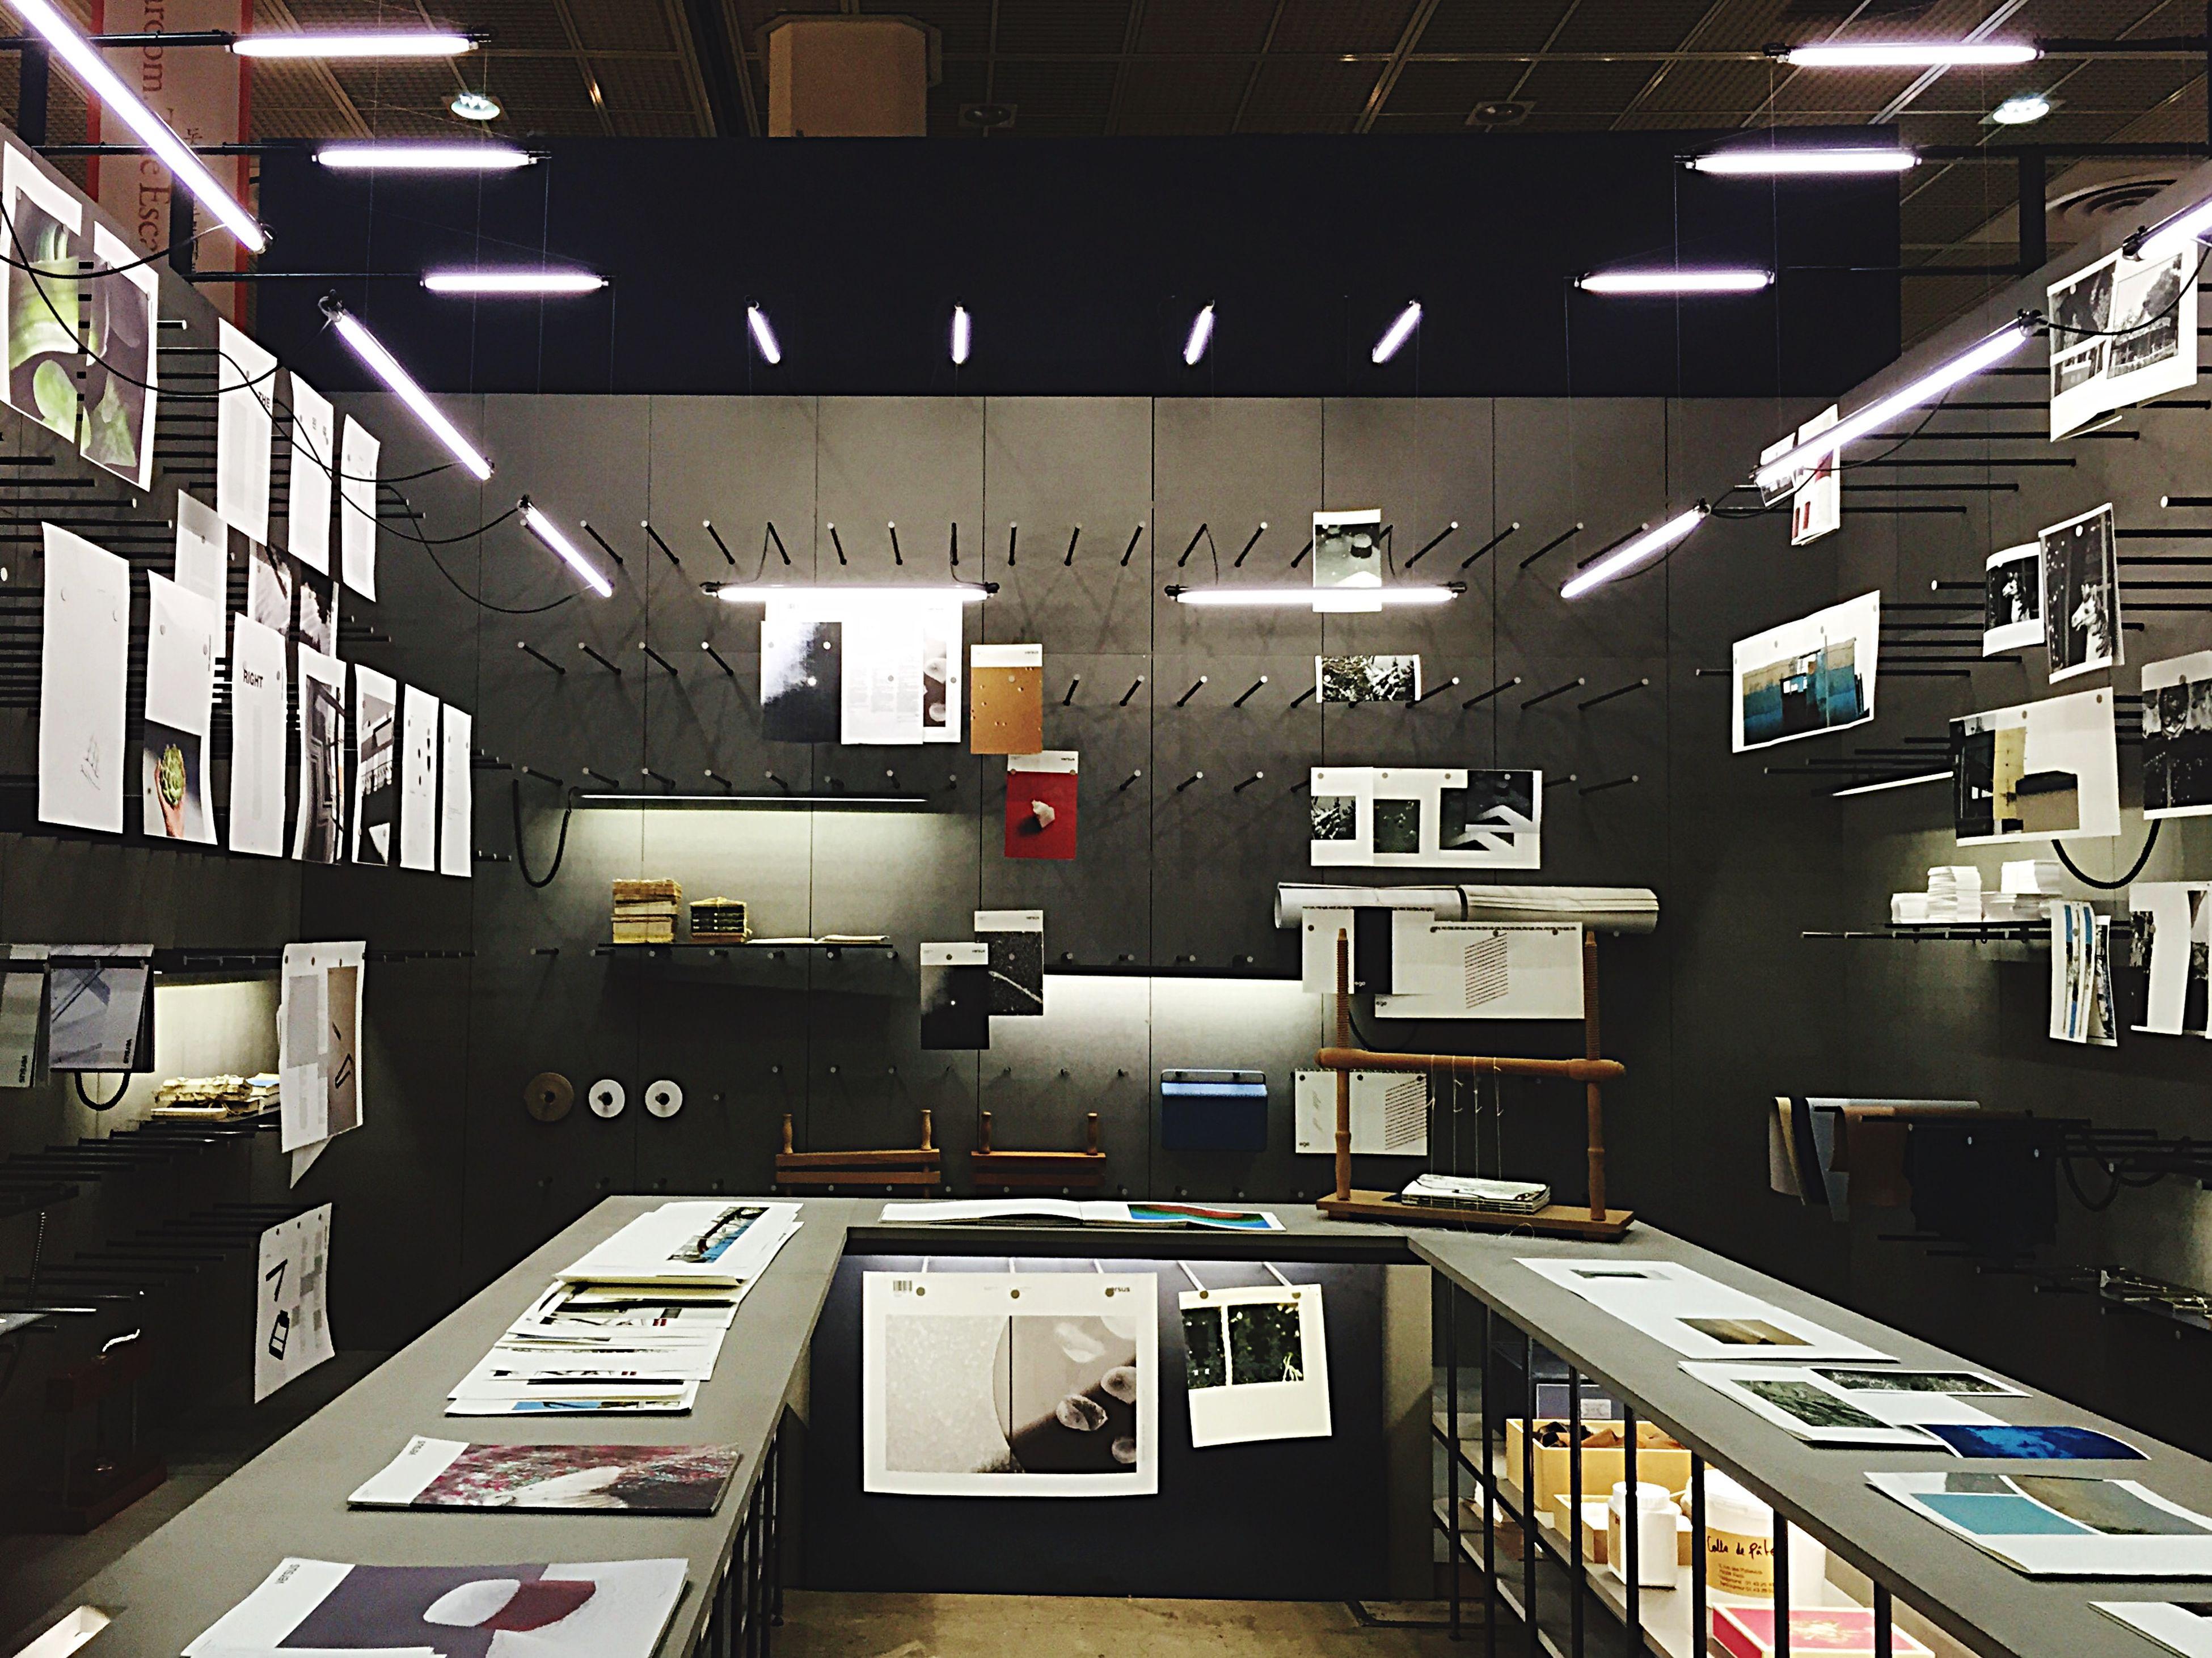 IPhoneography Eyem Best Shots Funny Taking Photos ArtWork Interior Design